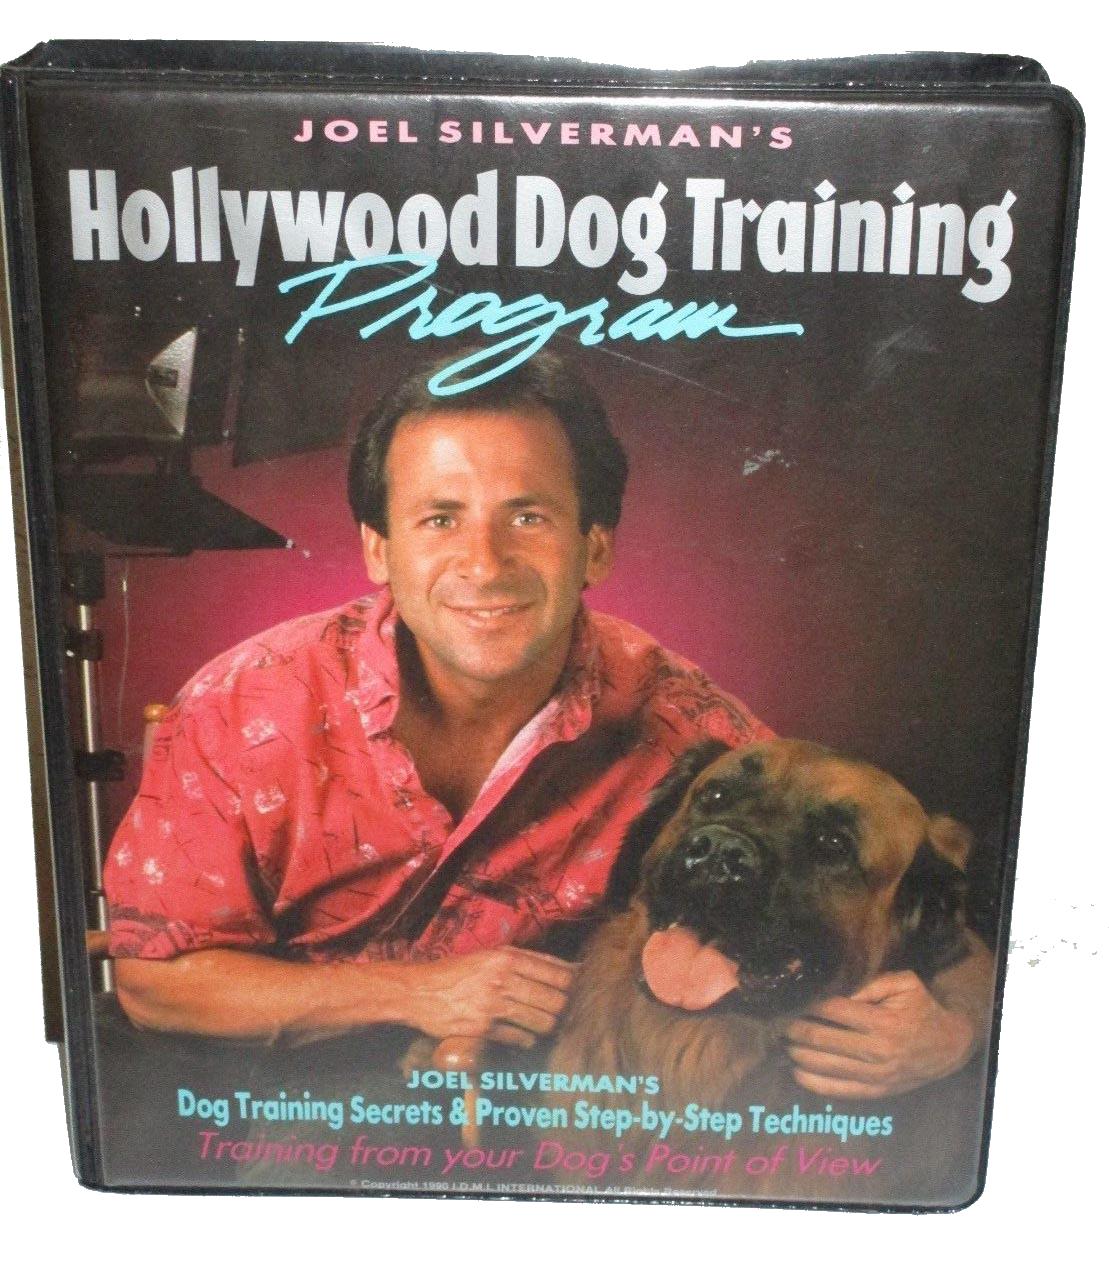 Joel Silverman's Hollywood Dog Training Porgram